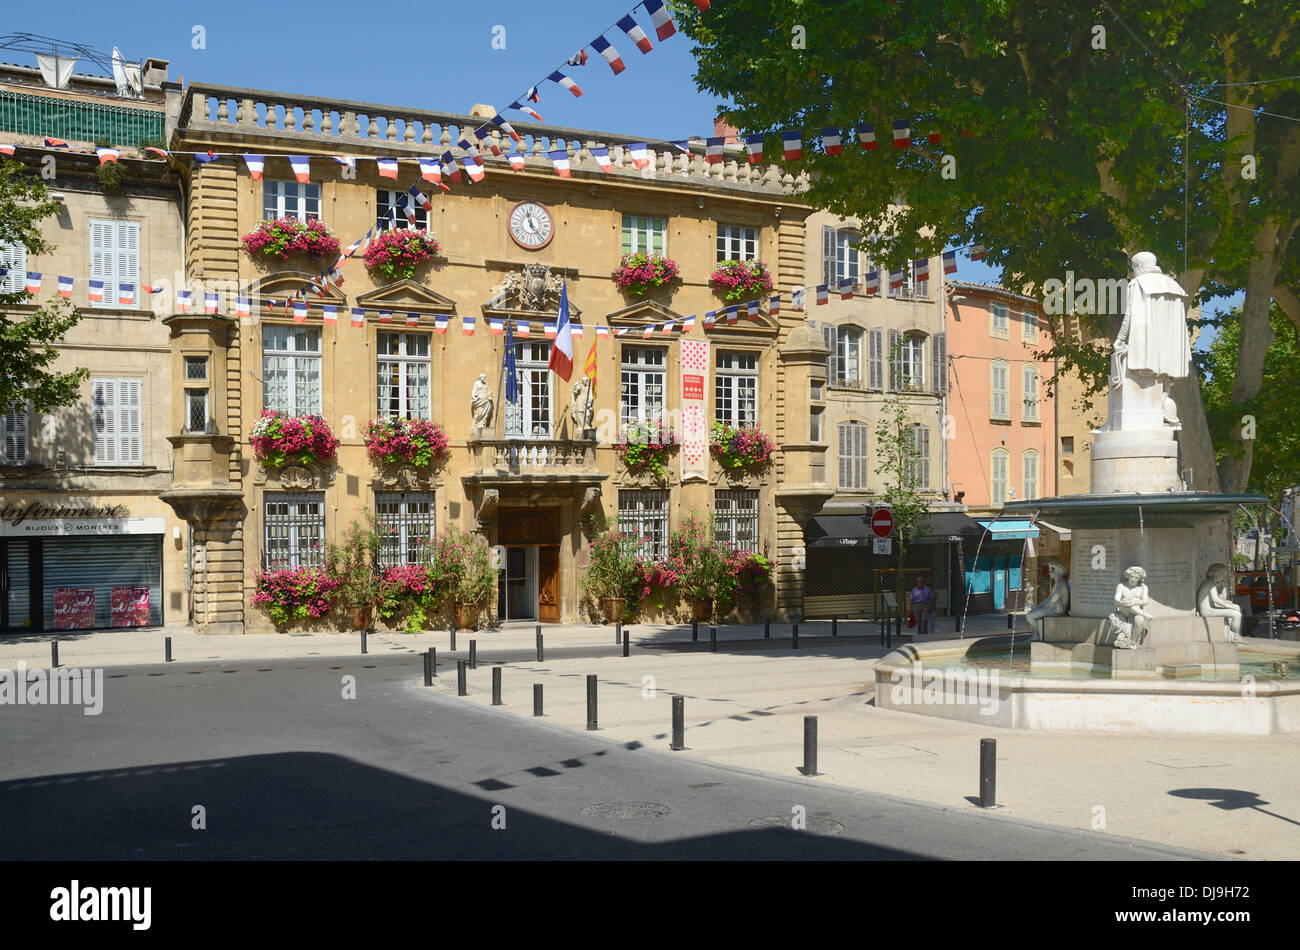 Salon de provence salon de provence with salon de for Cours anglais salon de provence